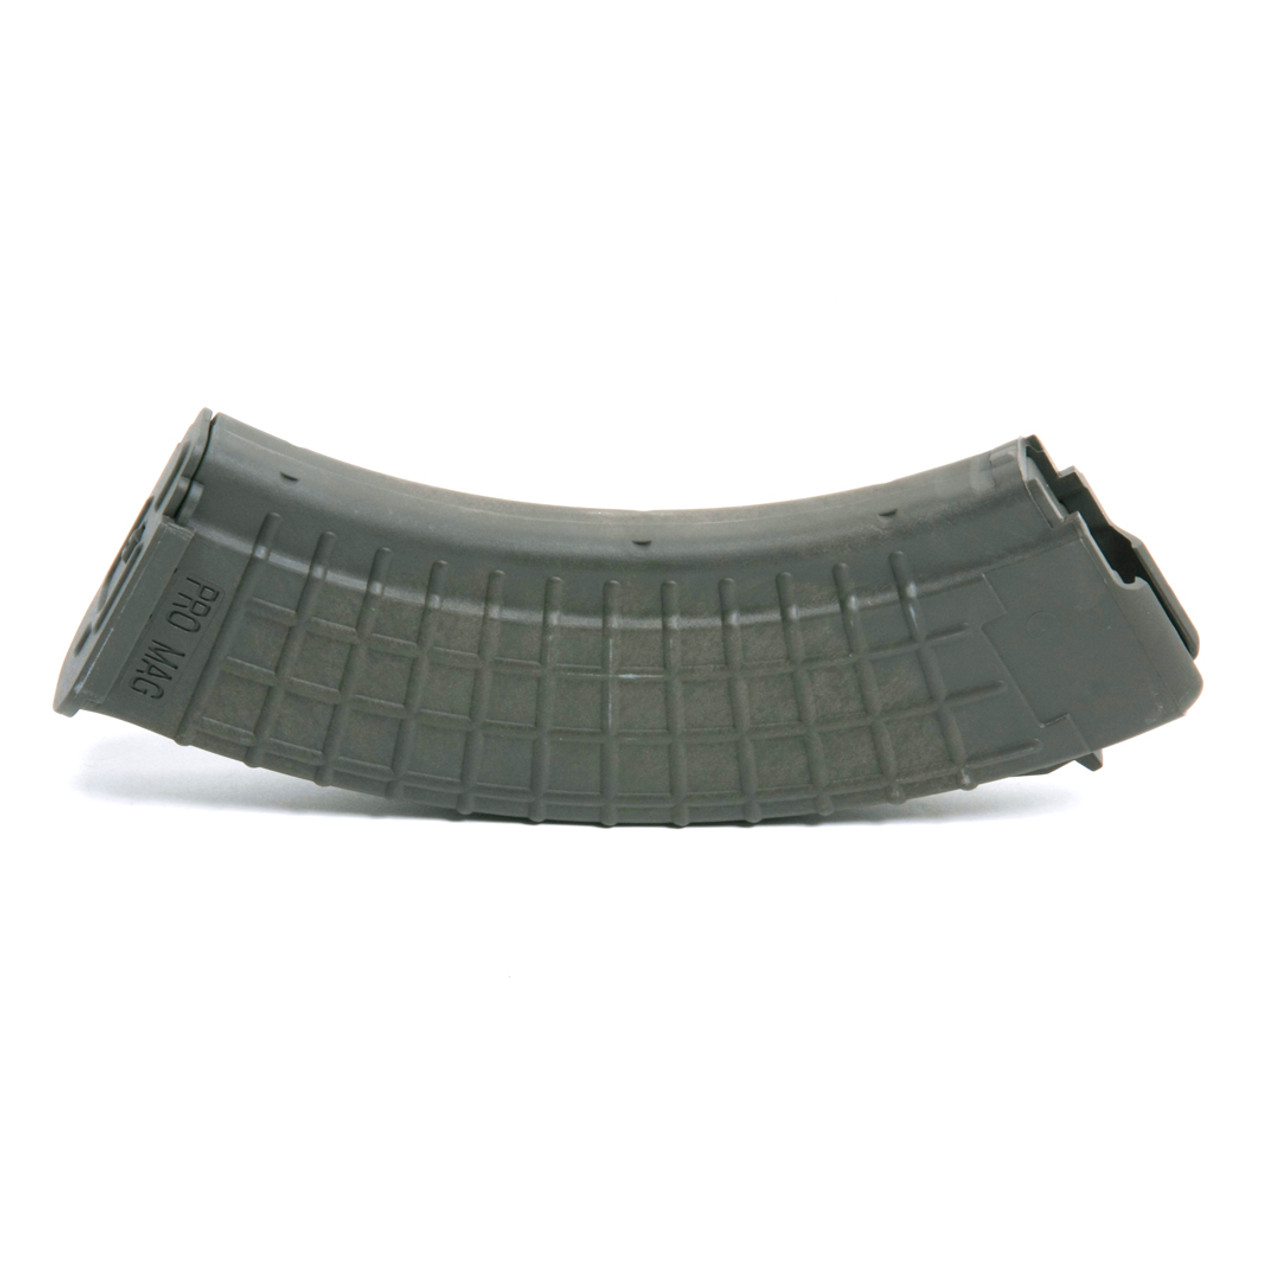 AK-47® 7.62x39mm (30) Rd - Olive Drab Polymer